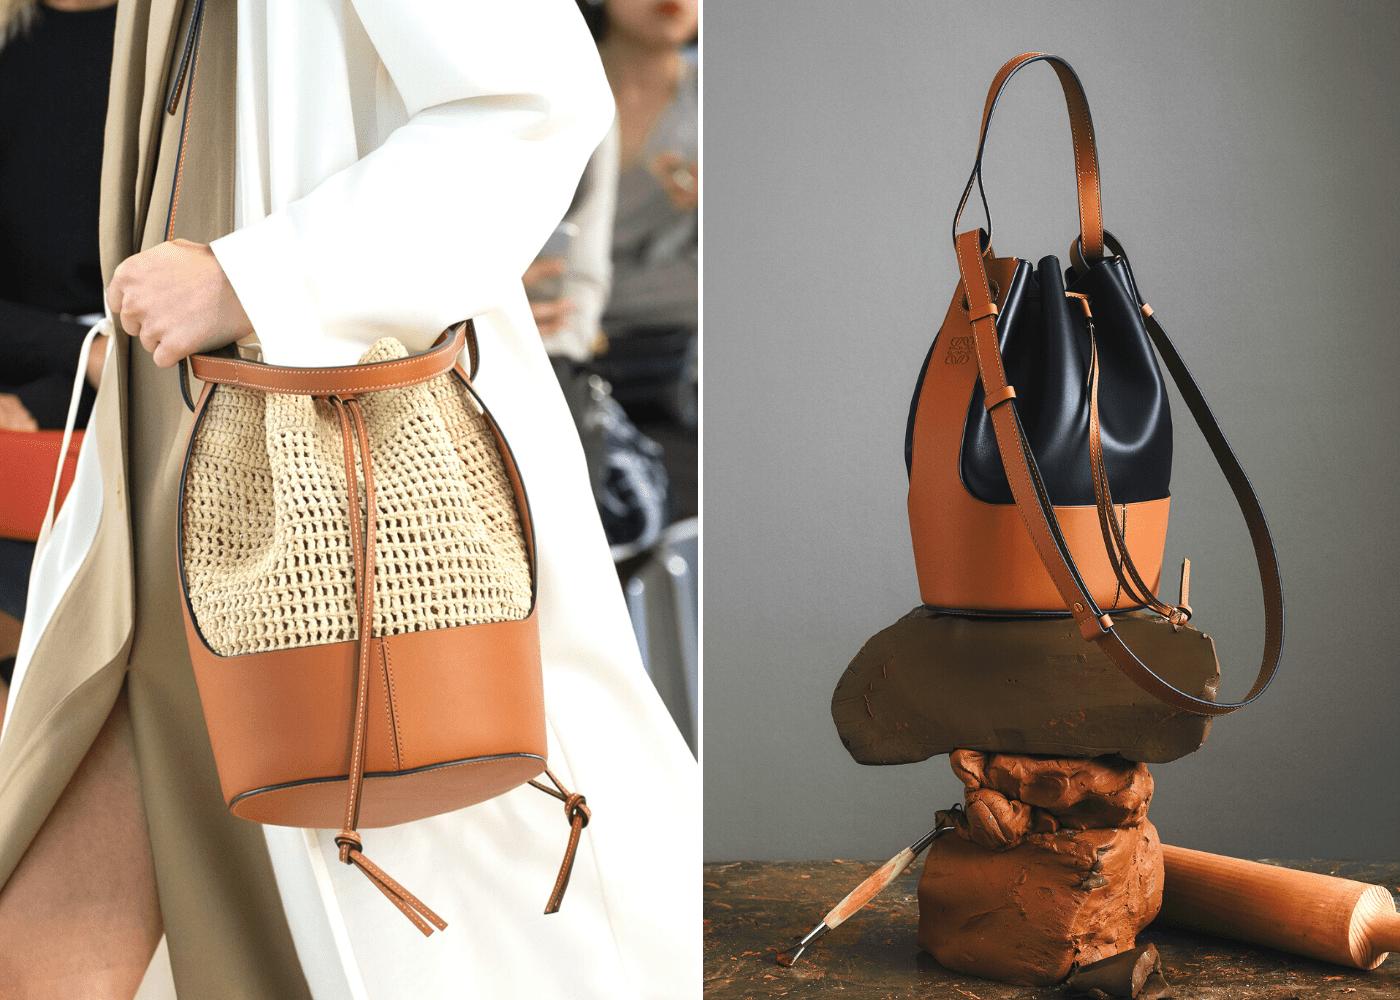 Spring Summer 2020 designer bags to shop online: Loewe Balloon bag